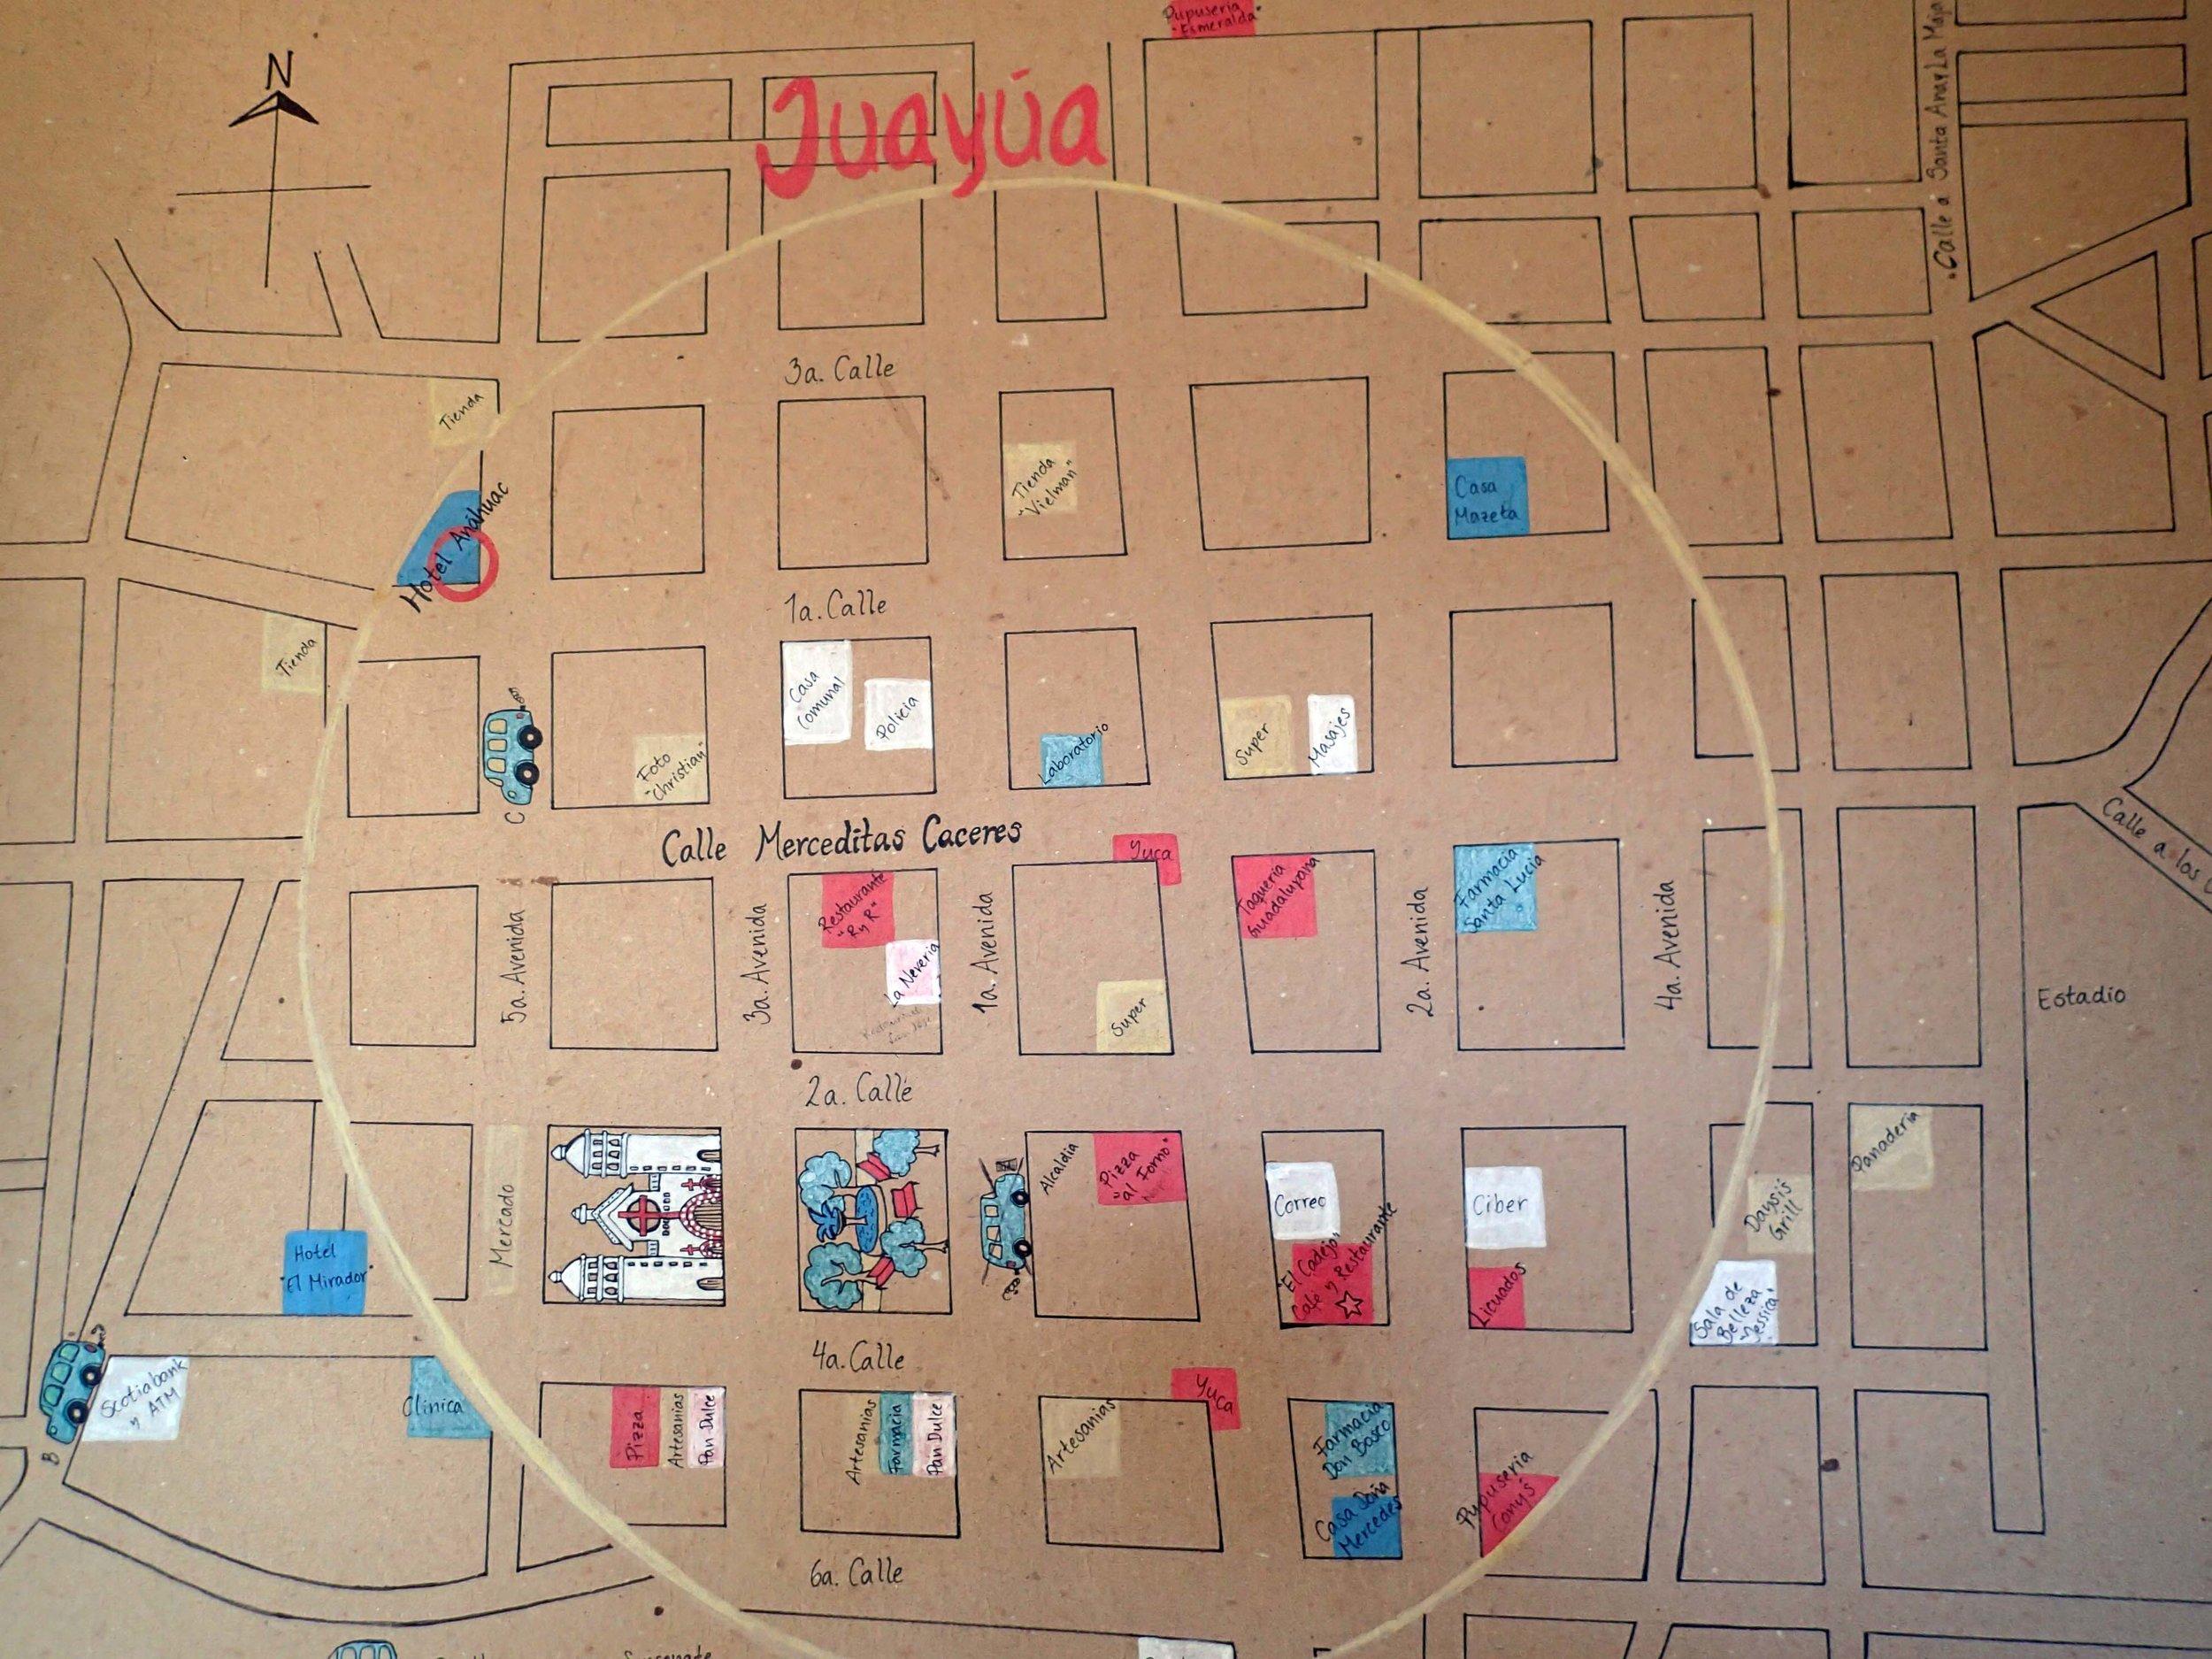 Juyua map.jpg